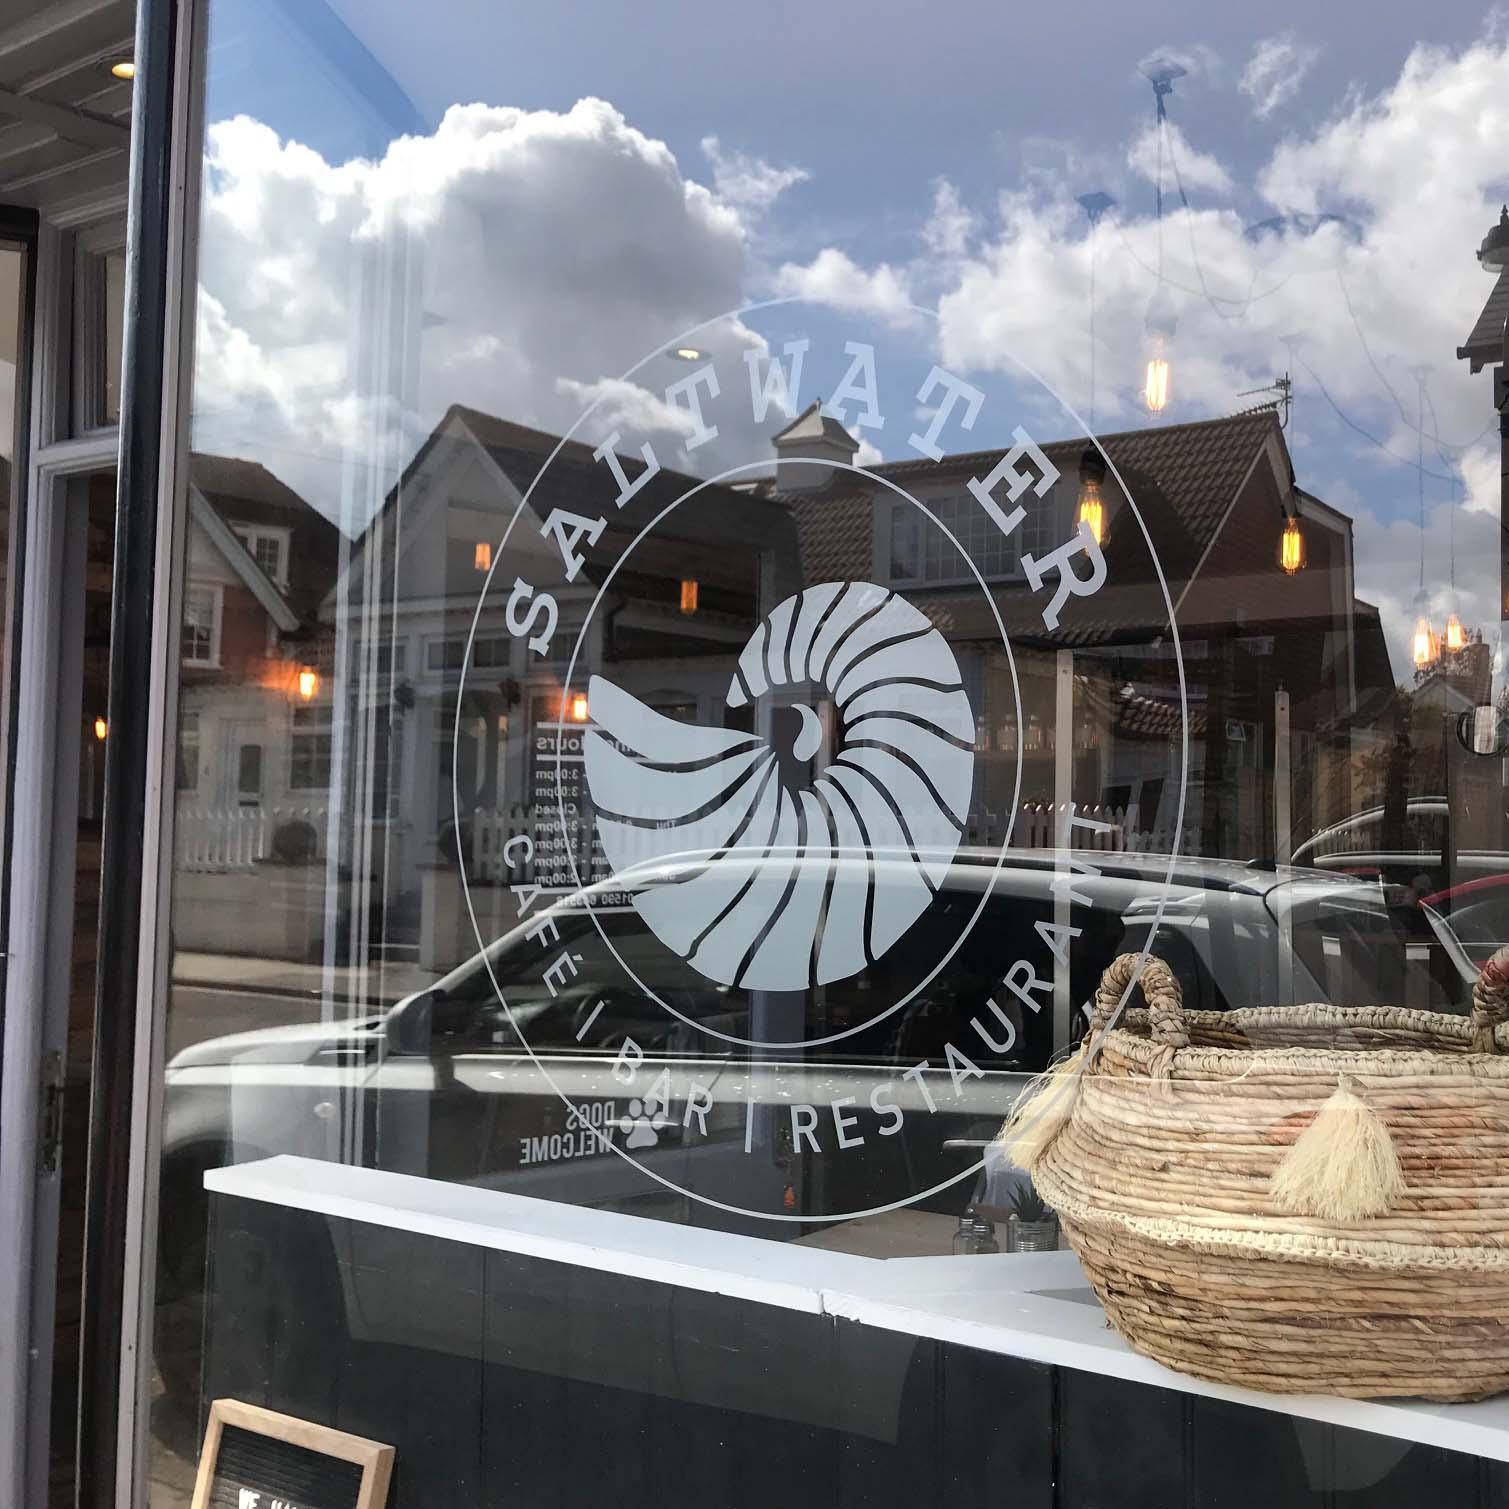 saltwater shop front design